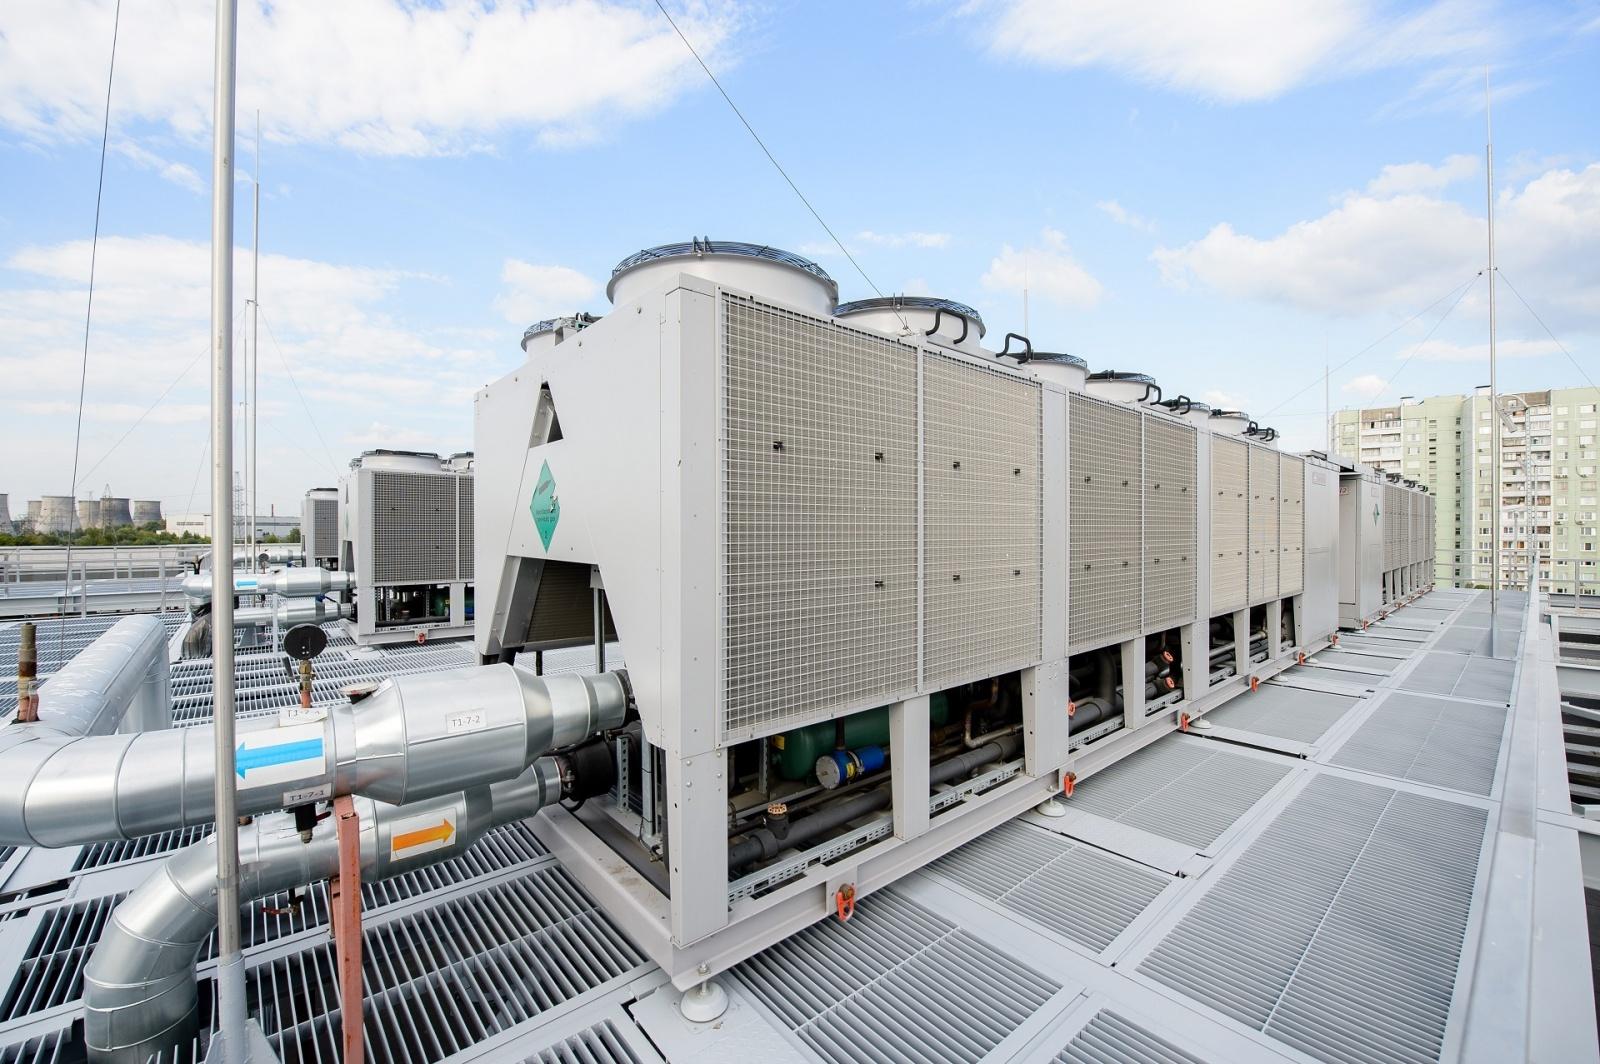 Как создавалась система холодоснабжения дата-центра NORD-4 - 10